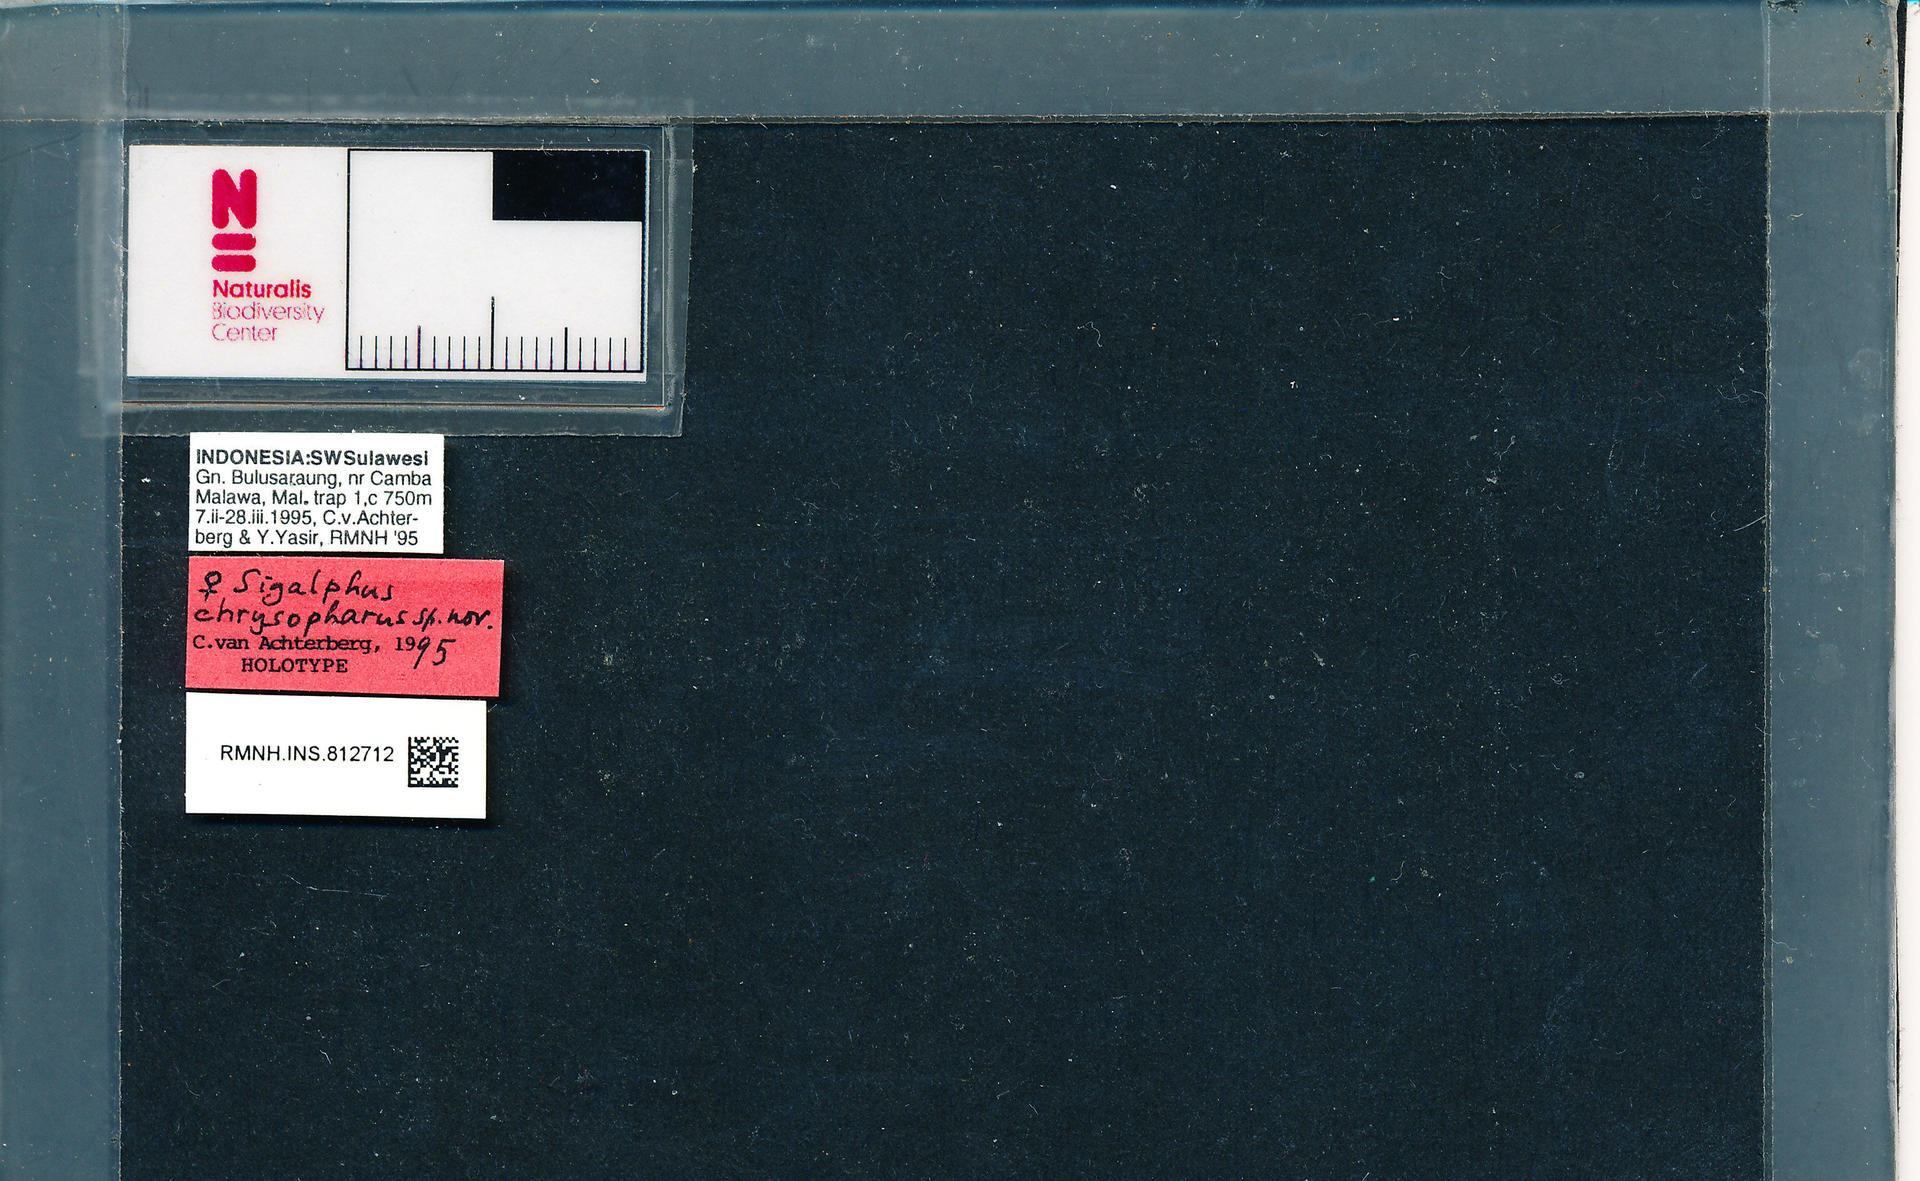 RMNH.INS.812712 | Sigalphus chrysopharus van Achterberg, 1995